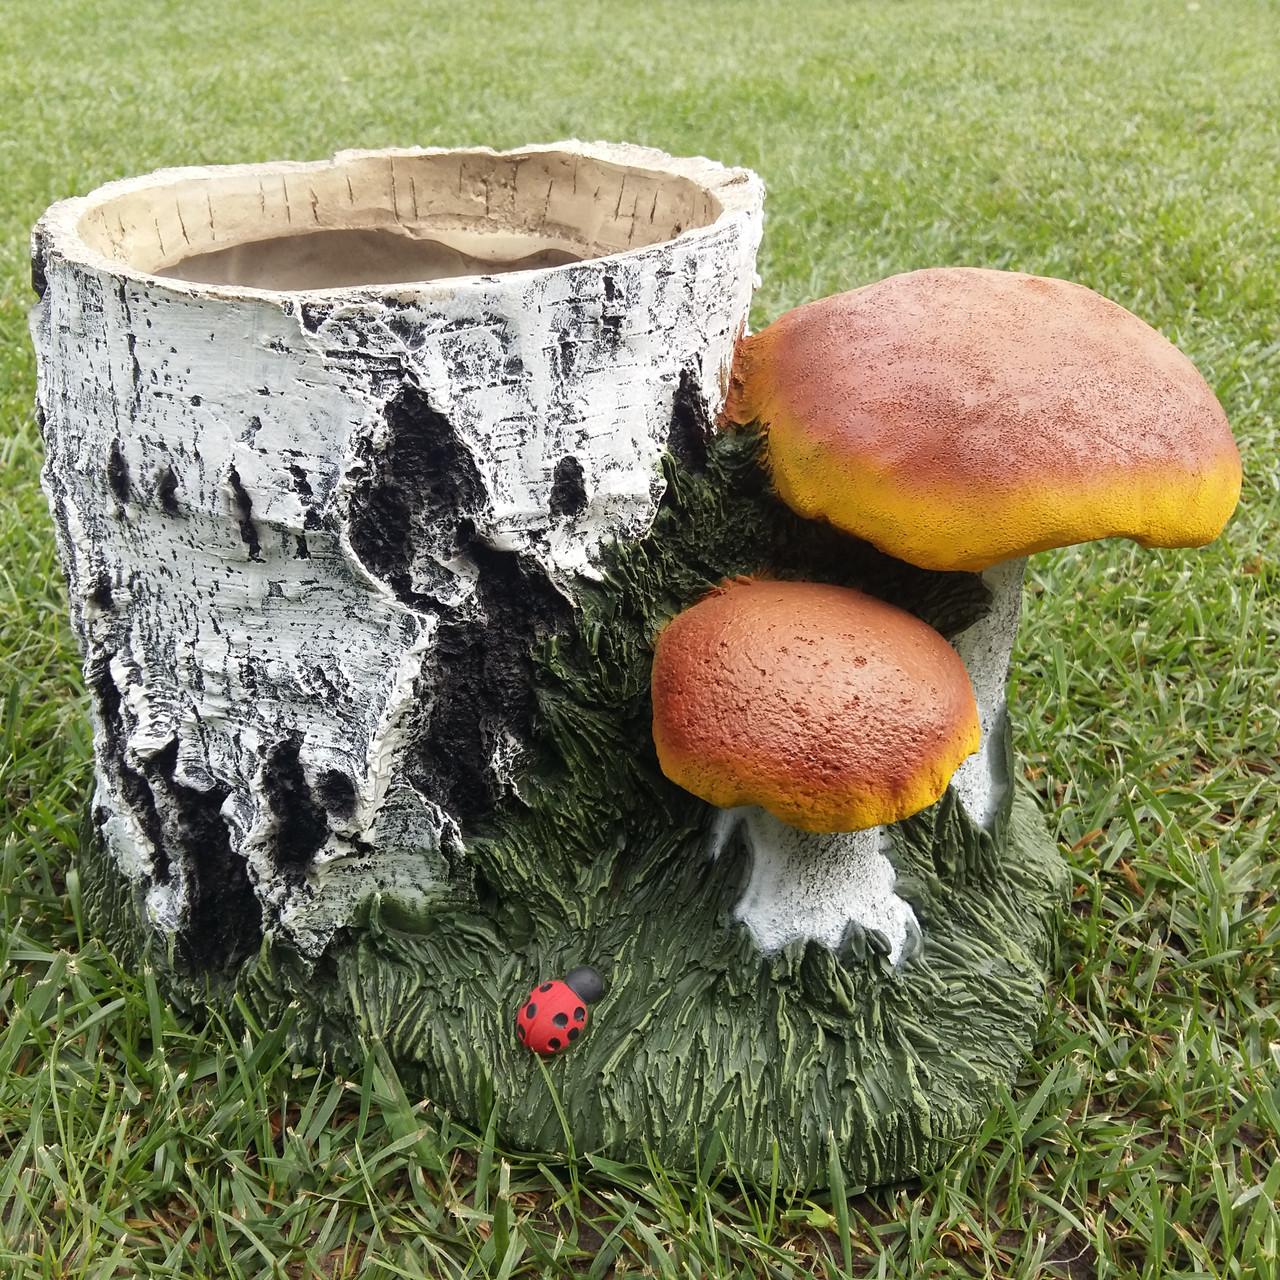 Картинки пня и грибов